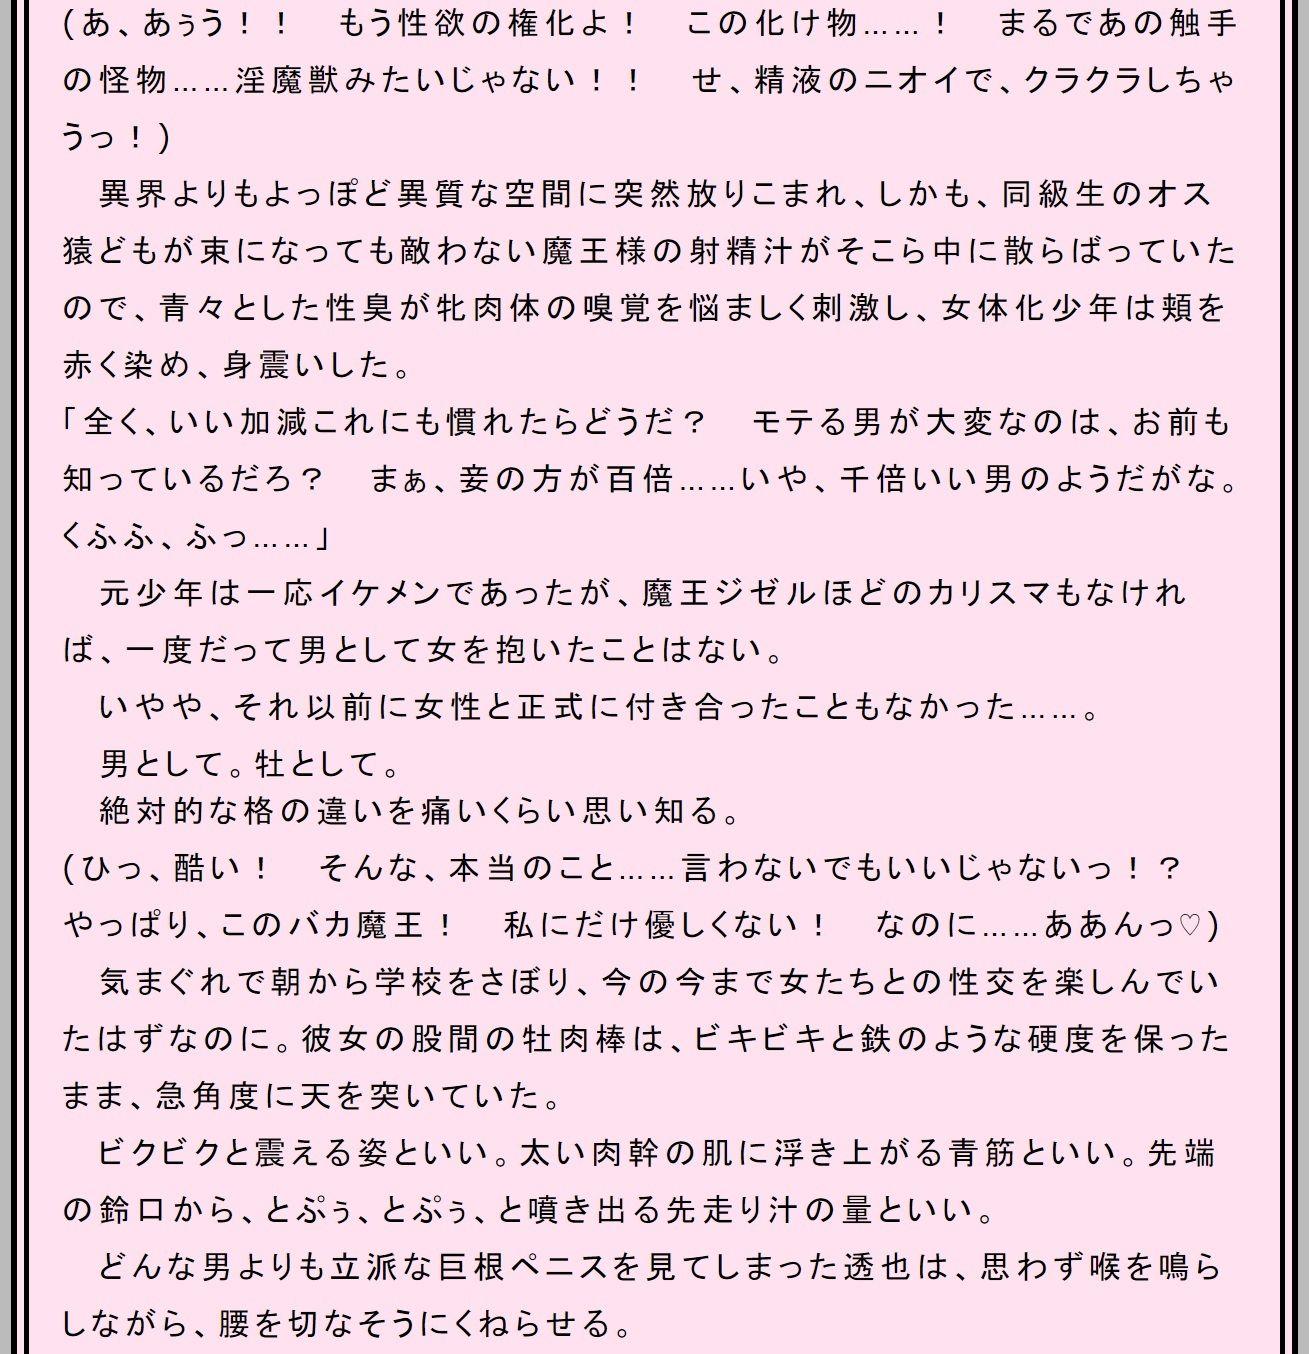 性転魔王~吉沢透也の牝奴覚醒~